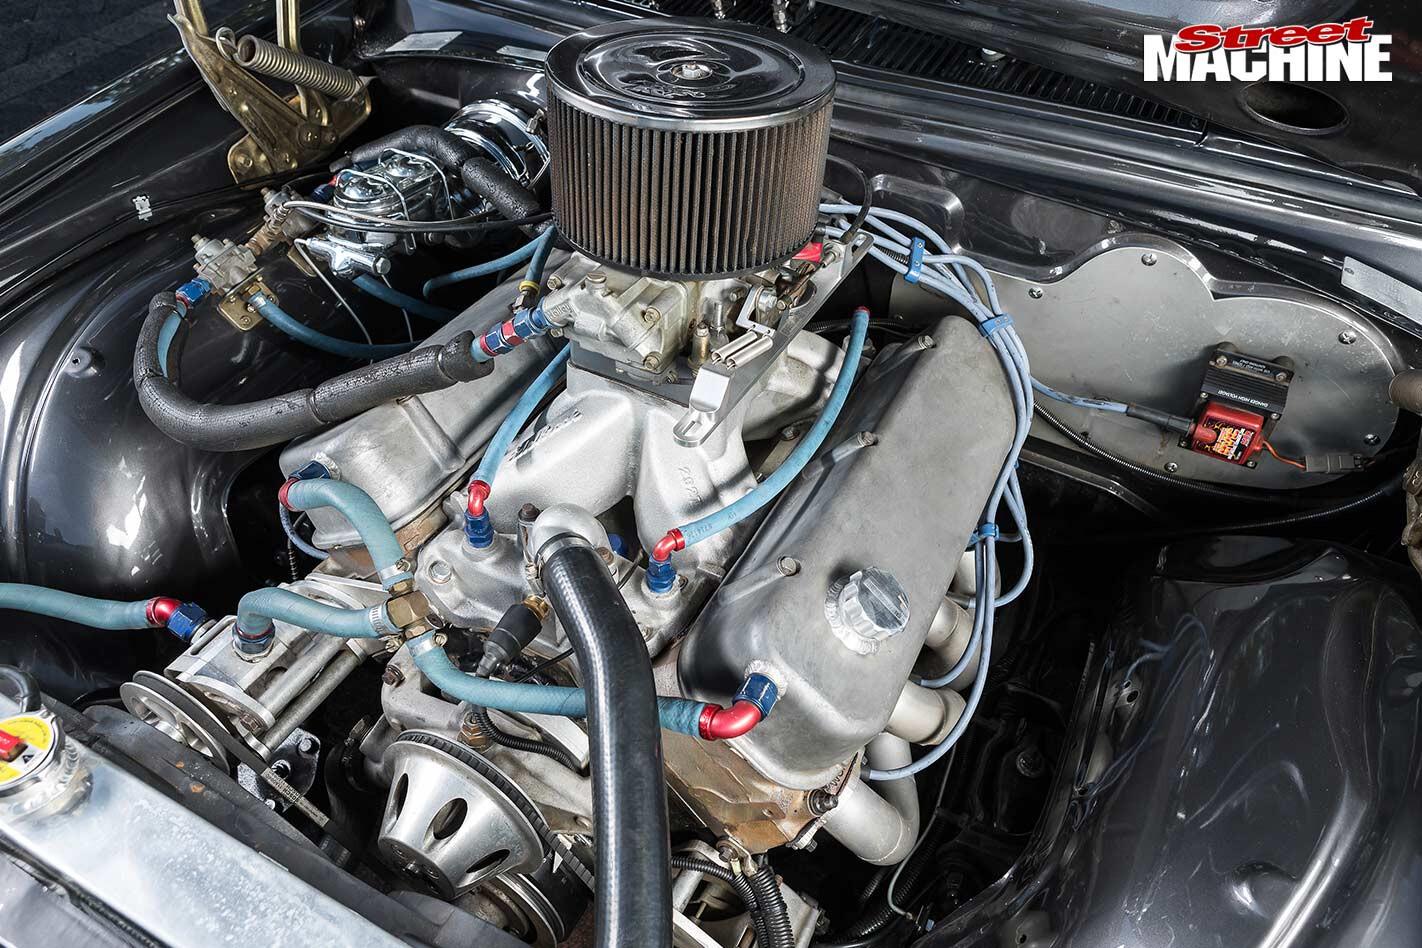 Holden One Tonner engine